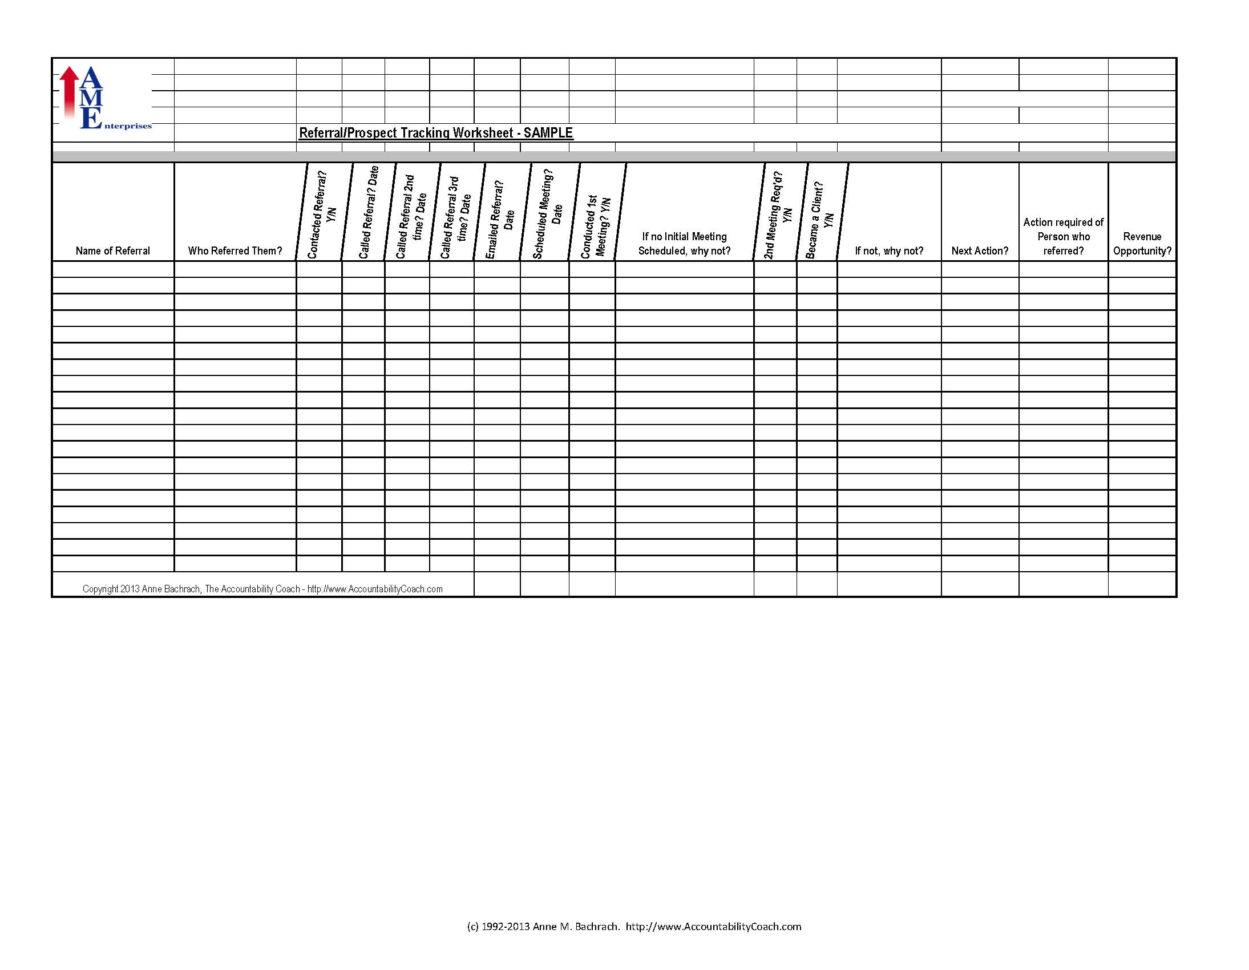 Spreadsheet Template Page 281 Melbourne Cup Calcutta Spreadsheet Portfolio Rebalancing